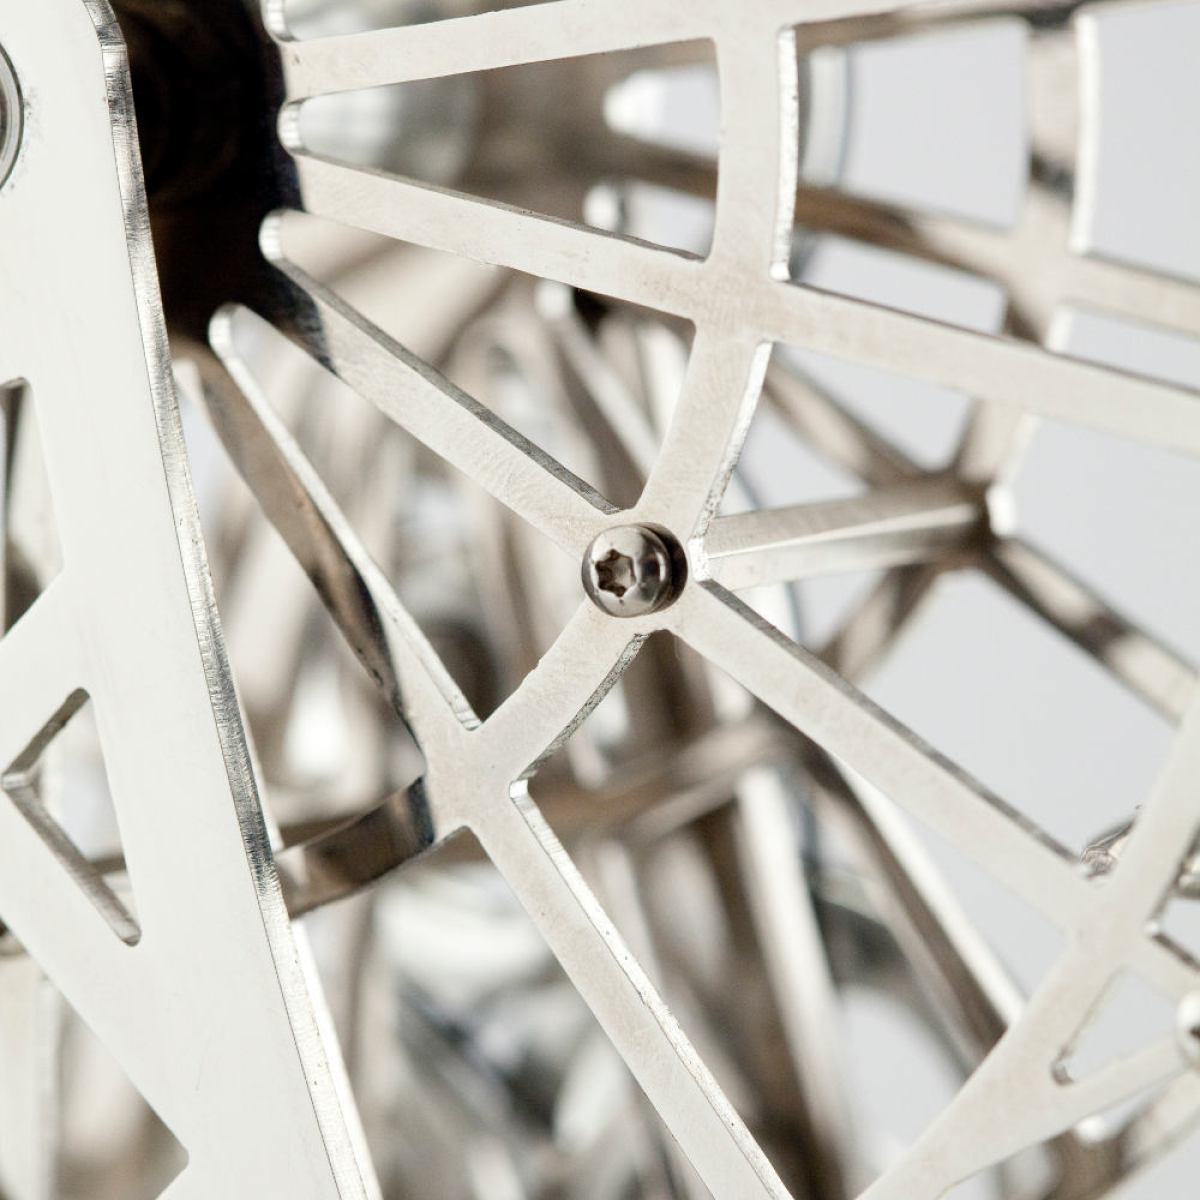 Nostalgic Ferris Wheel for Stirling Model Engines | Kunstbaron